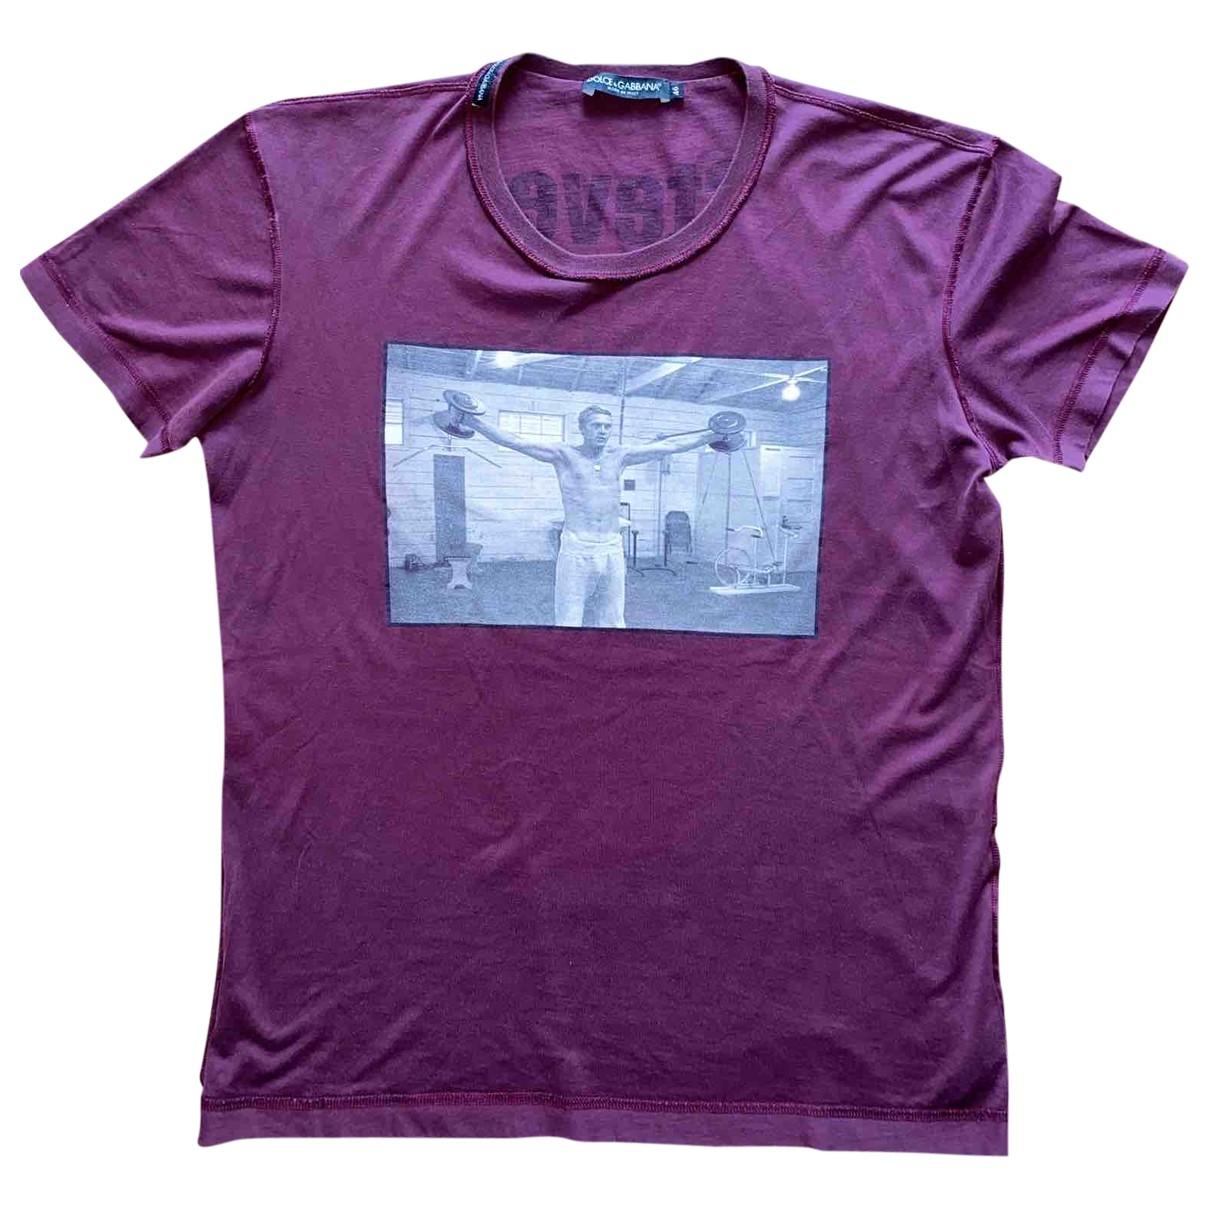 Dolce & Gabbana \N Burgundy Cotton T-shirts for Men M International